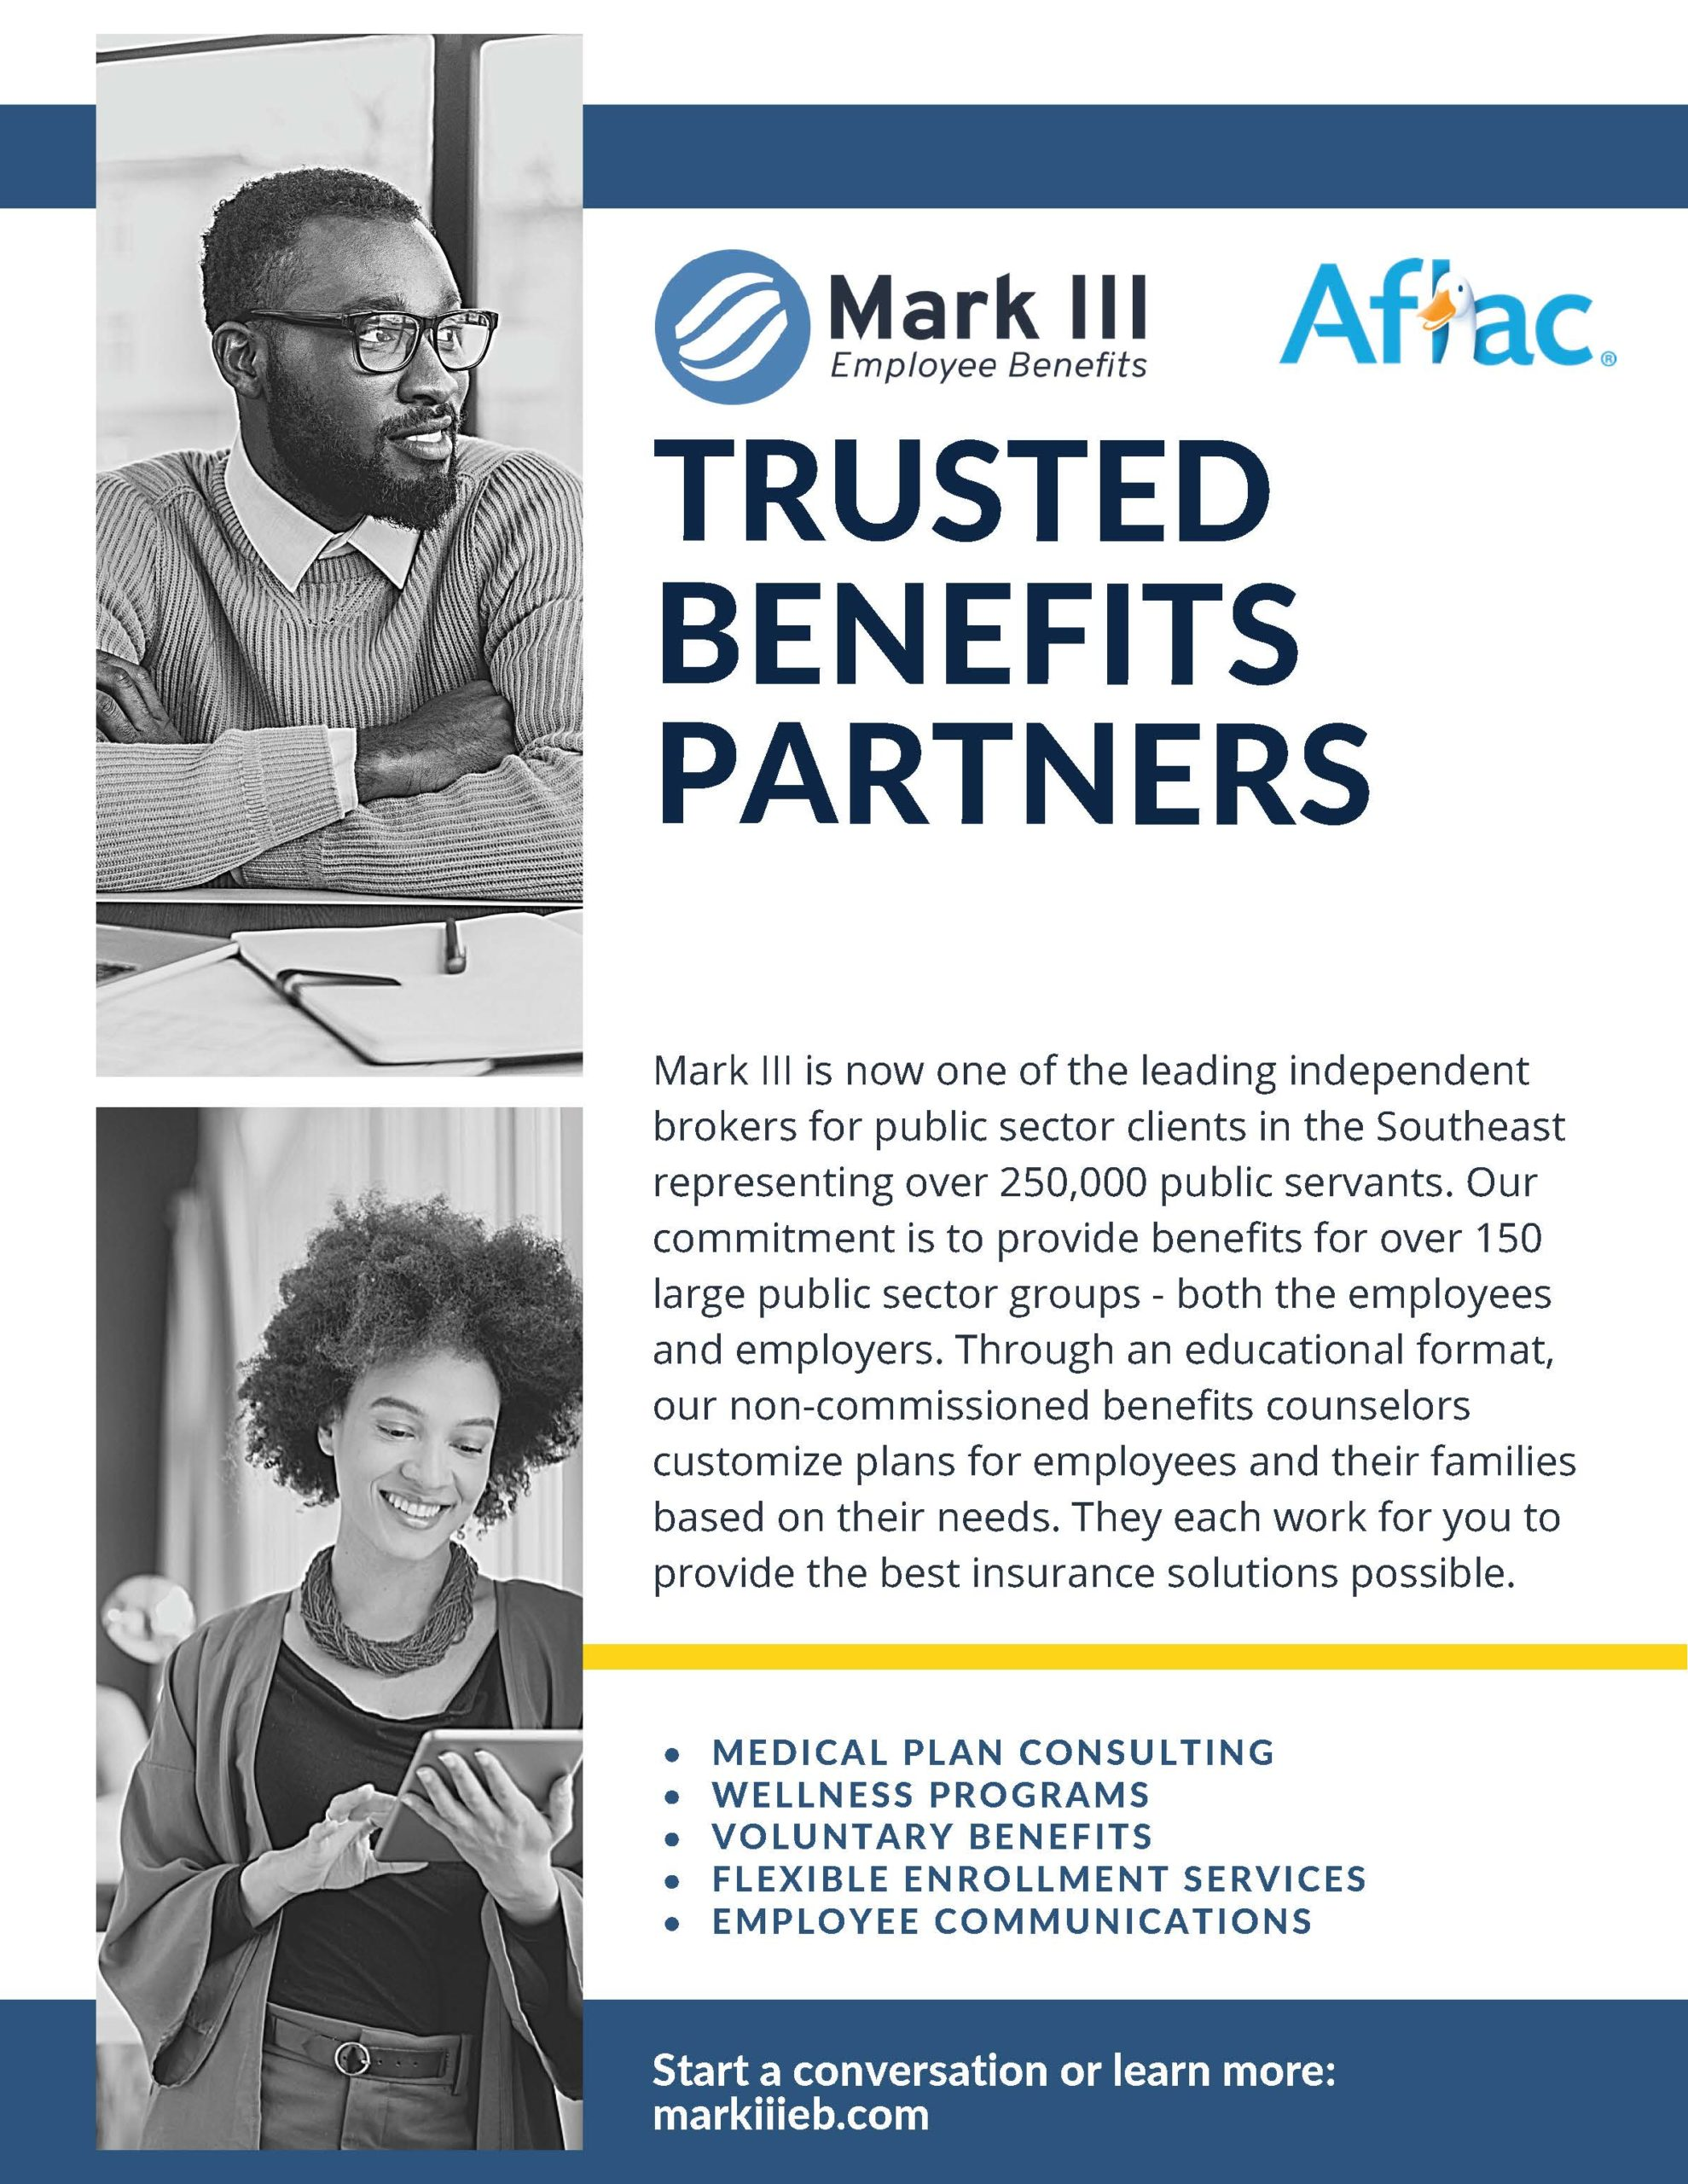 Ad: Mark III and Aflac